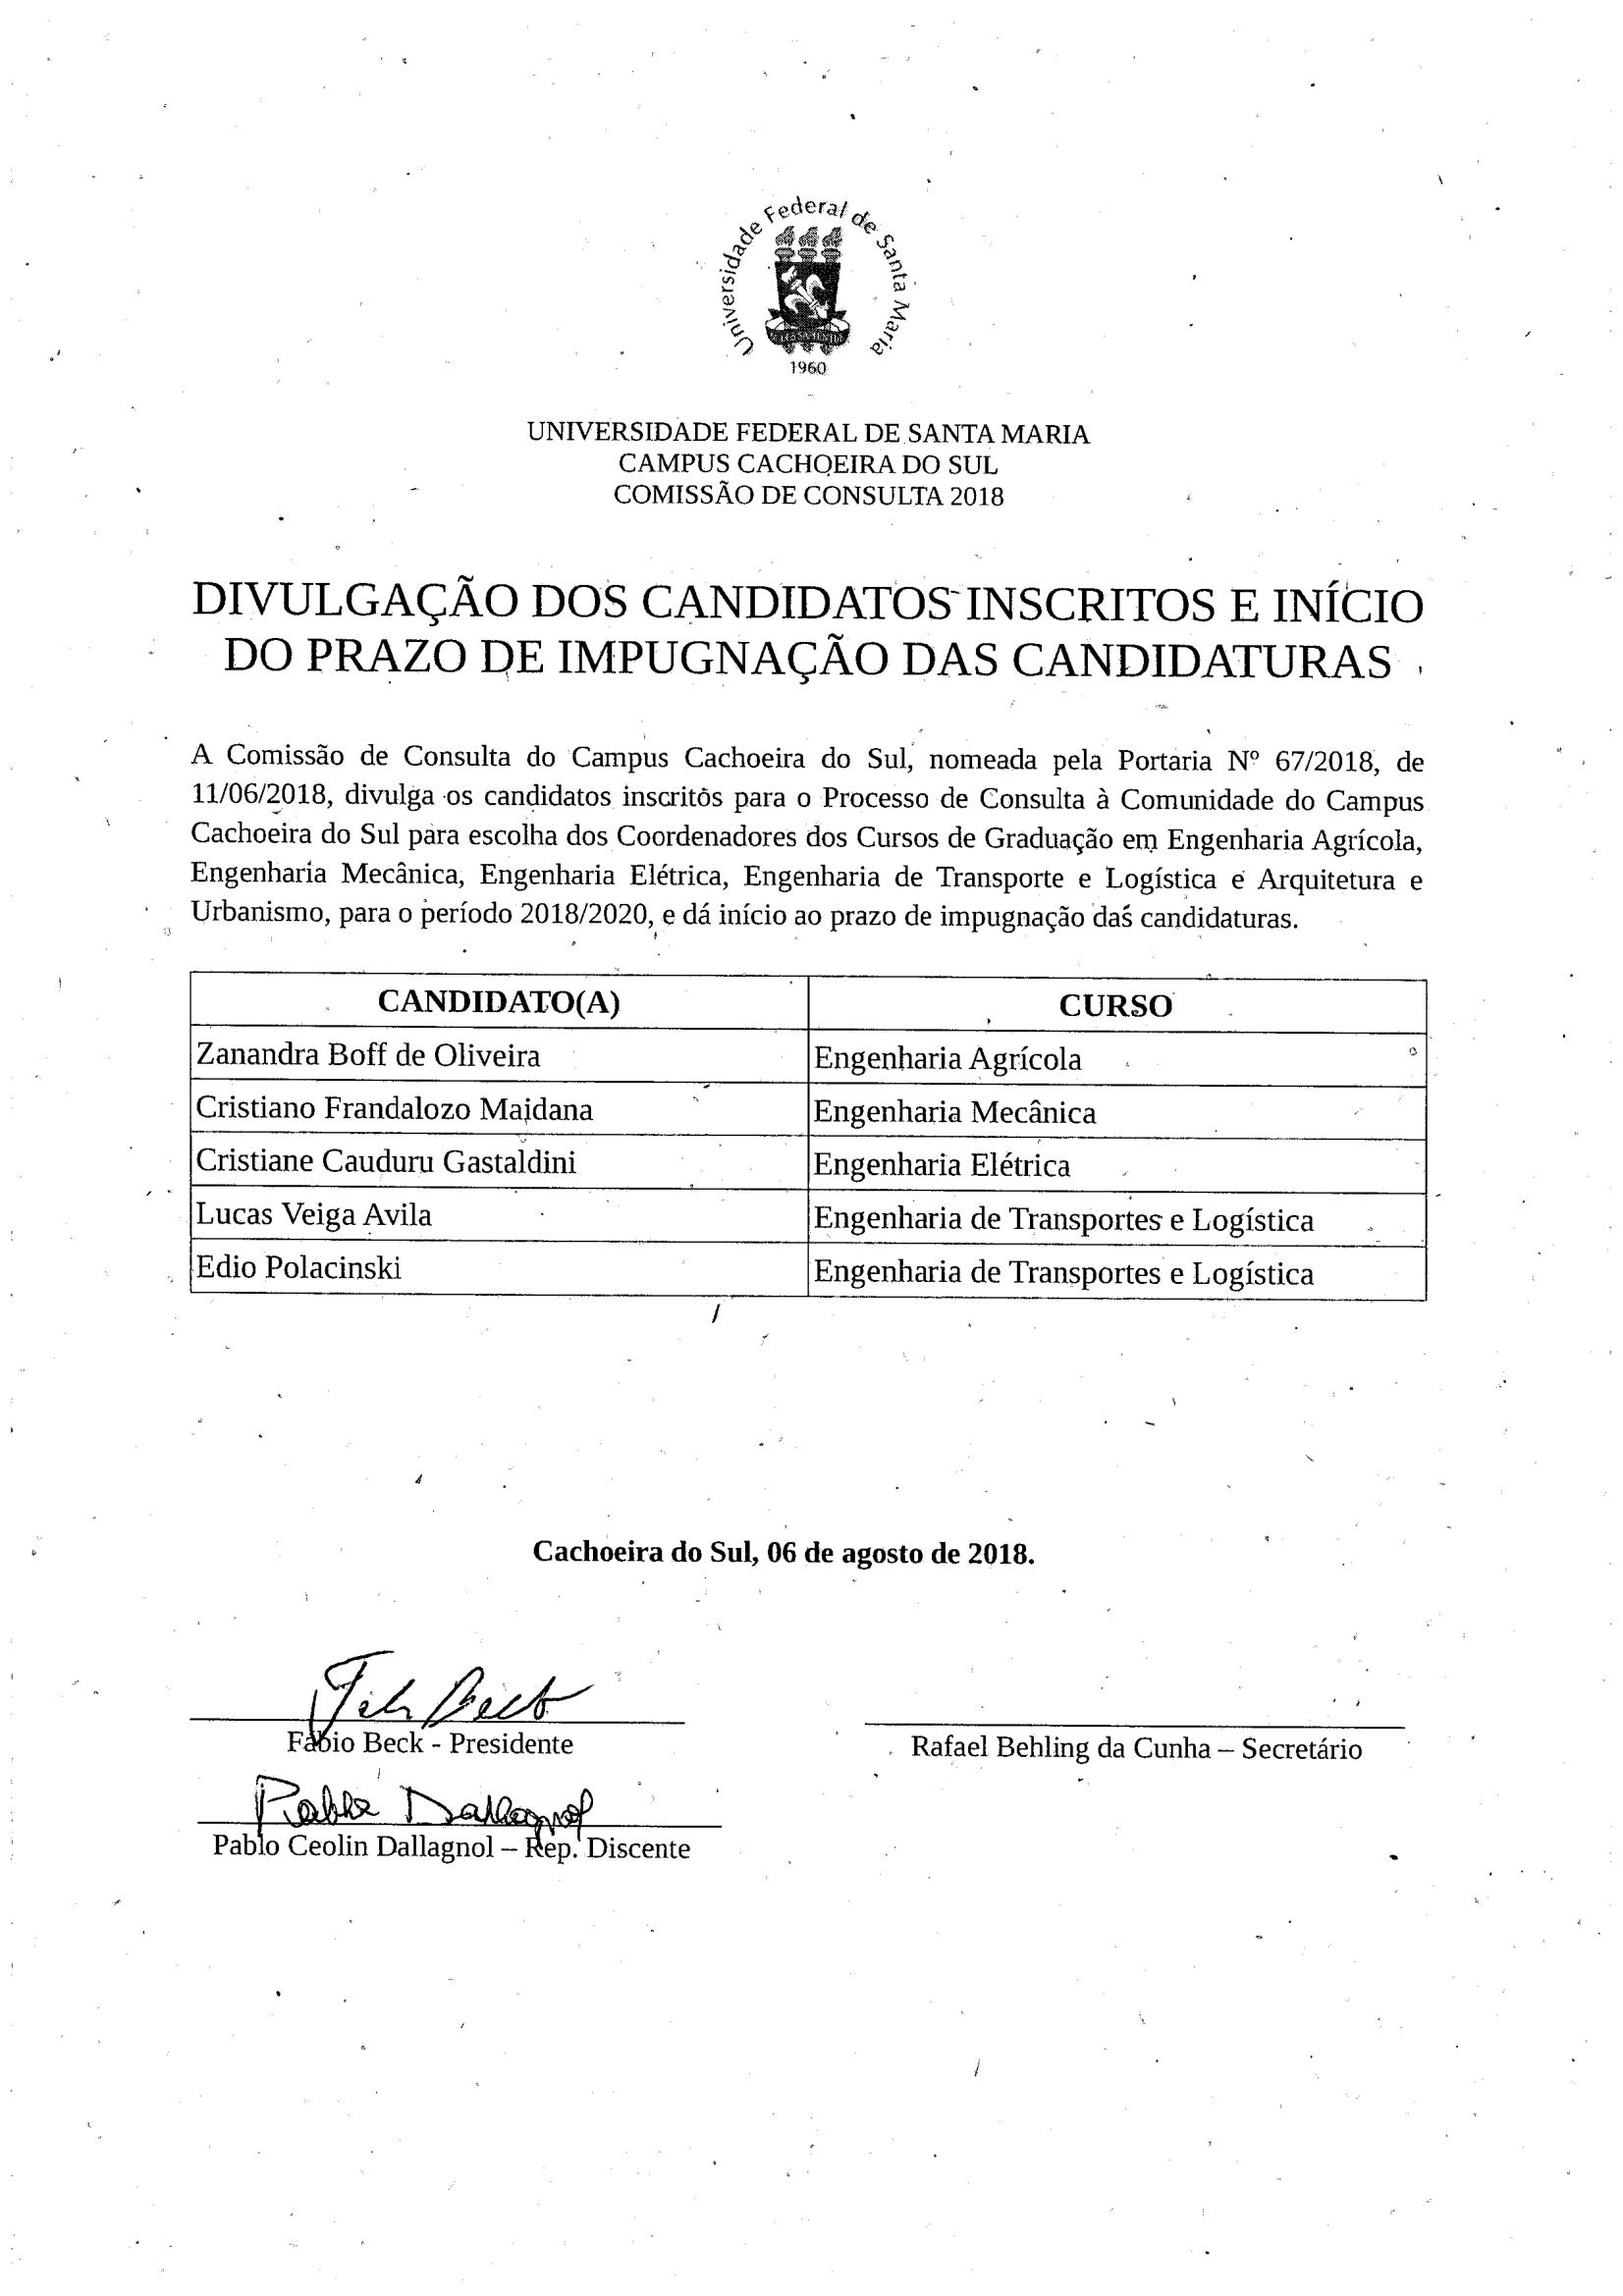 divulgacao candidatos inscritos 2018-1